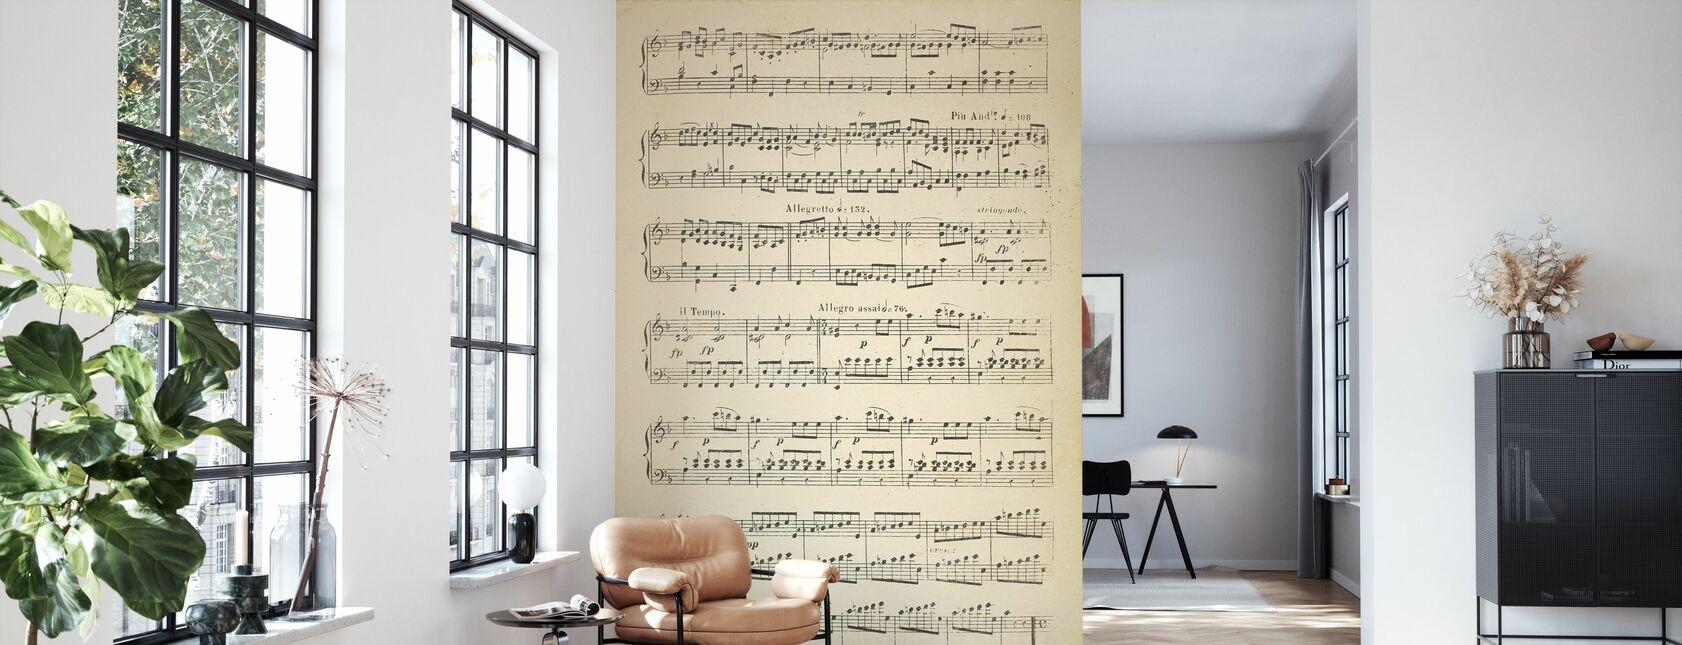 Musical Notes part 2 - Wallpaper - Living Room